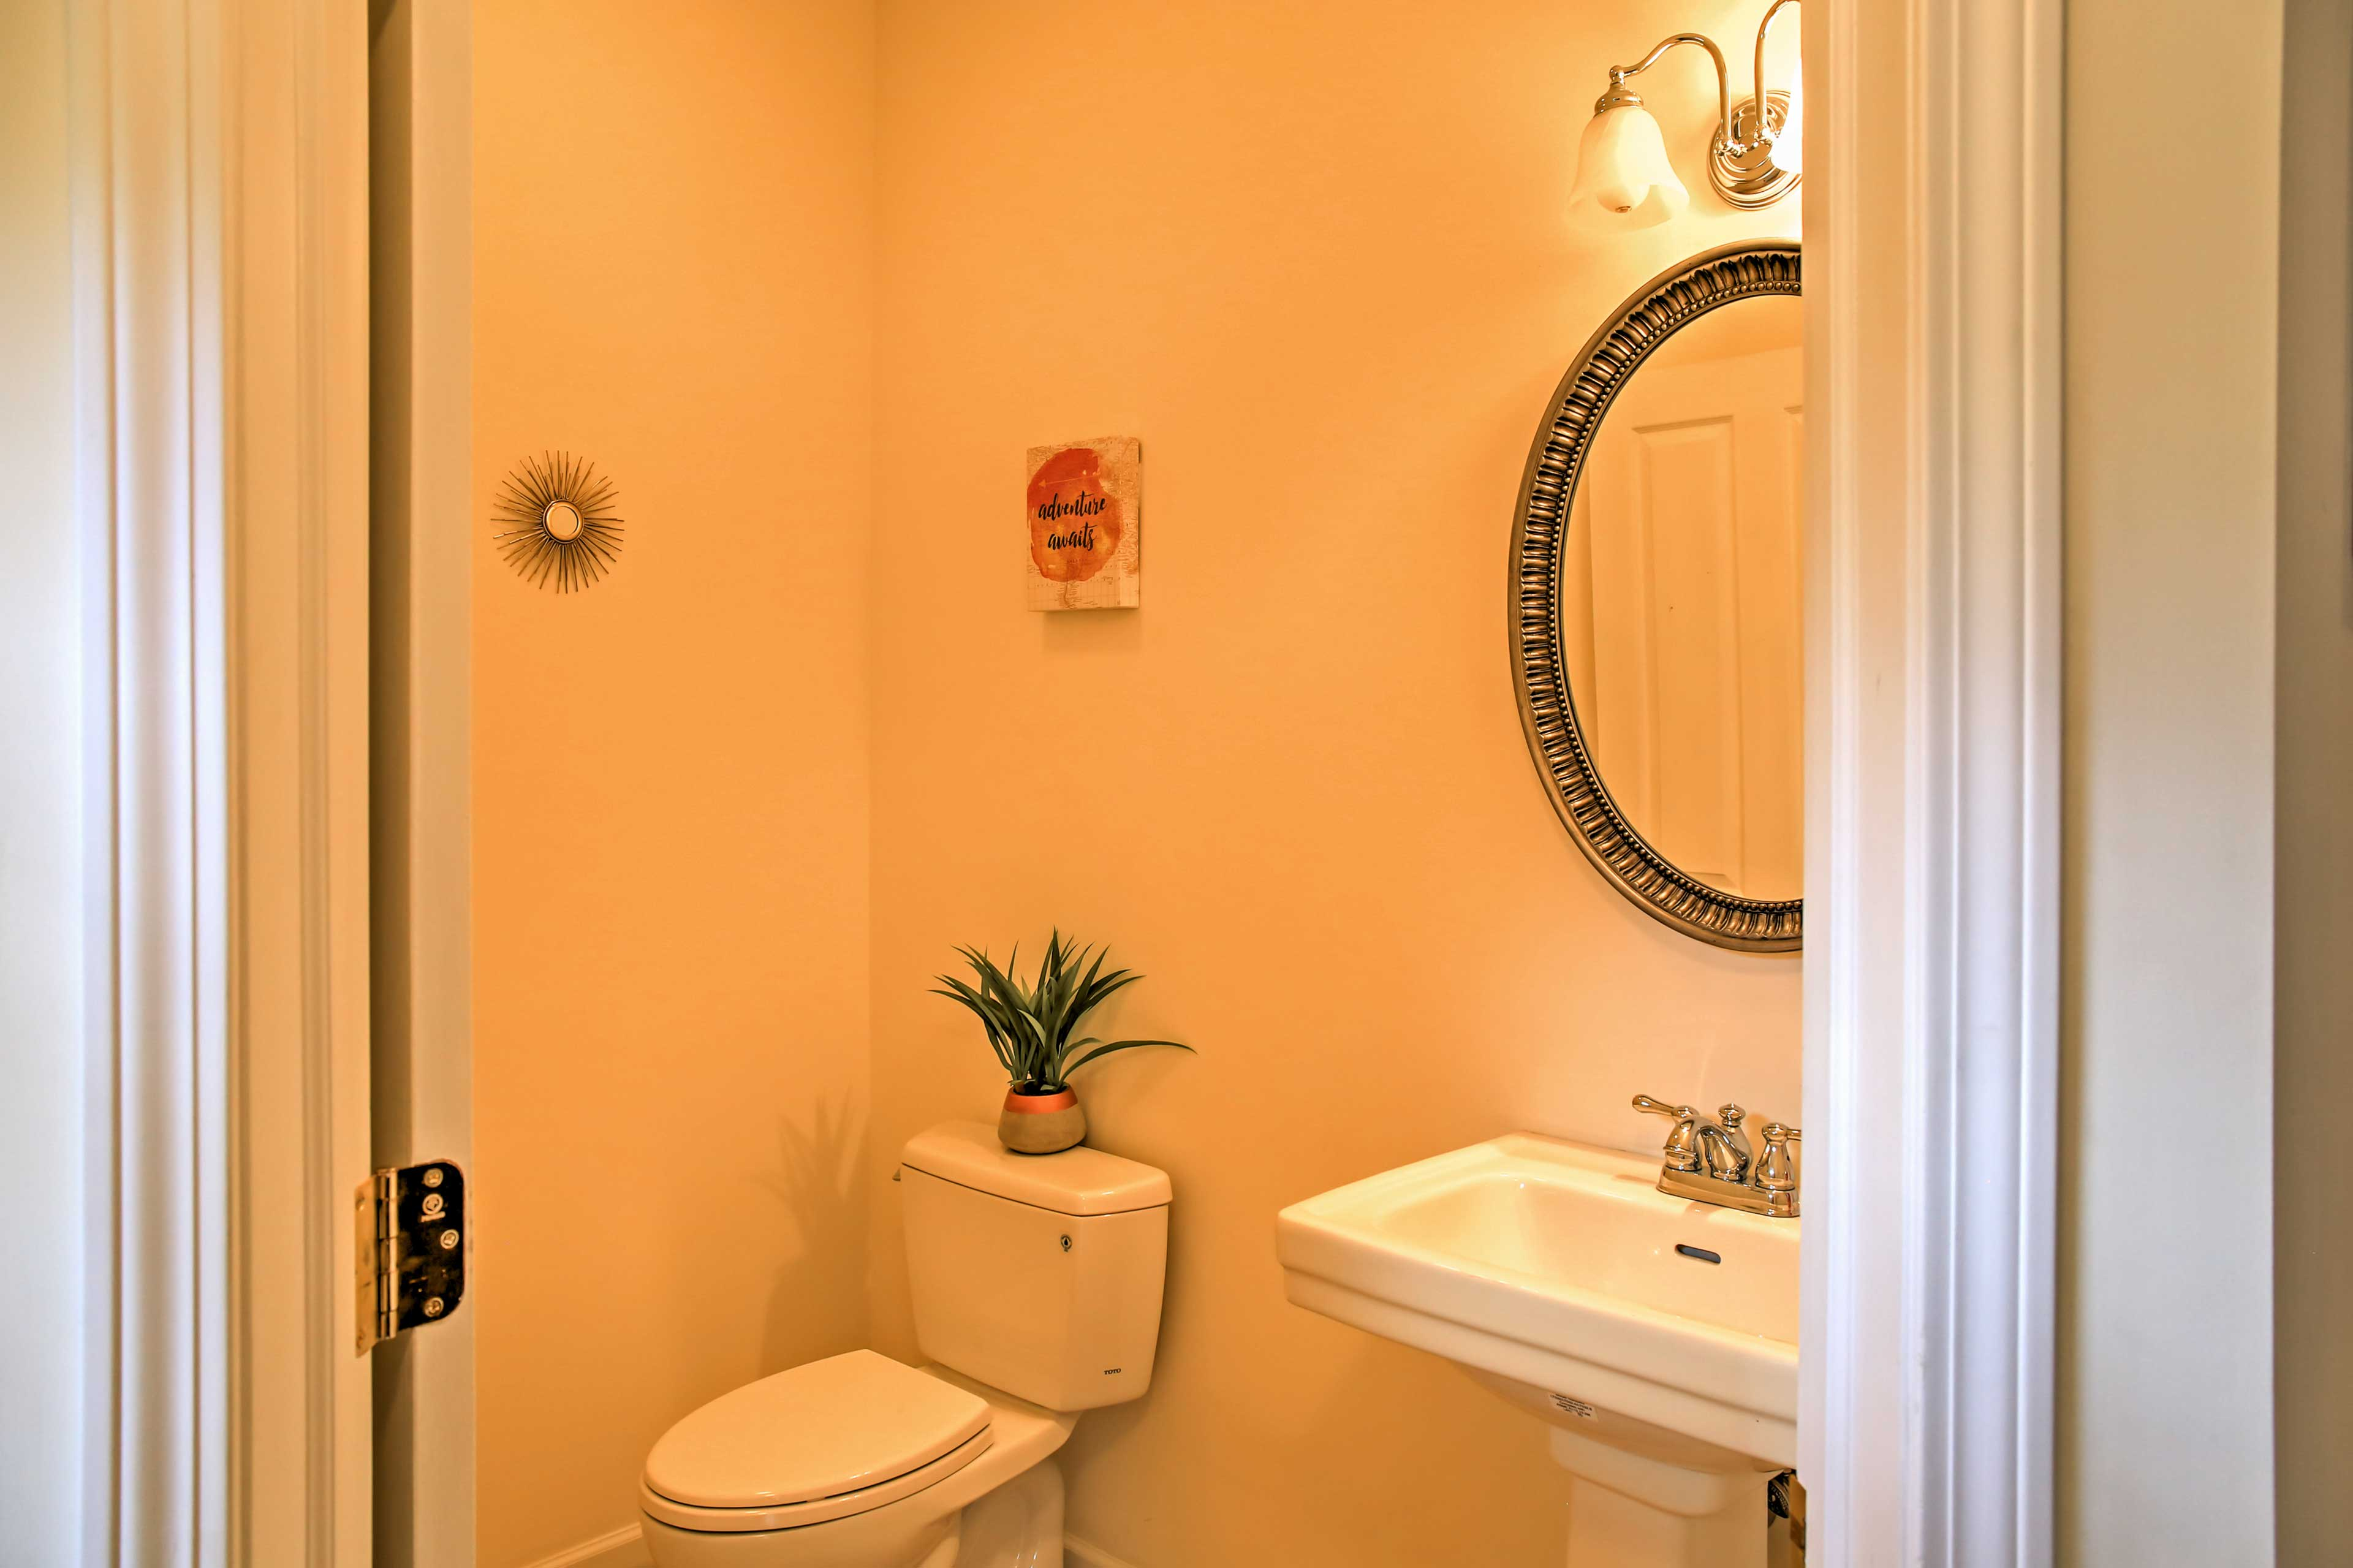 You'll find a half bath on the main floor.